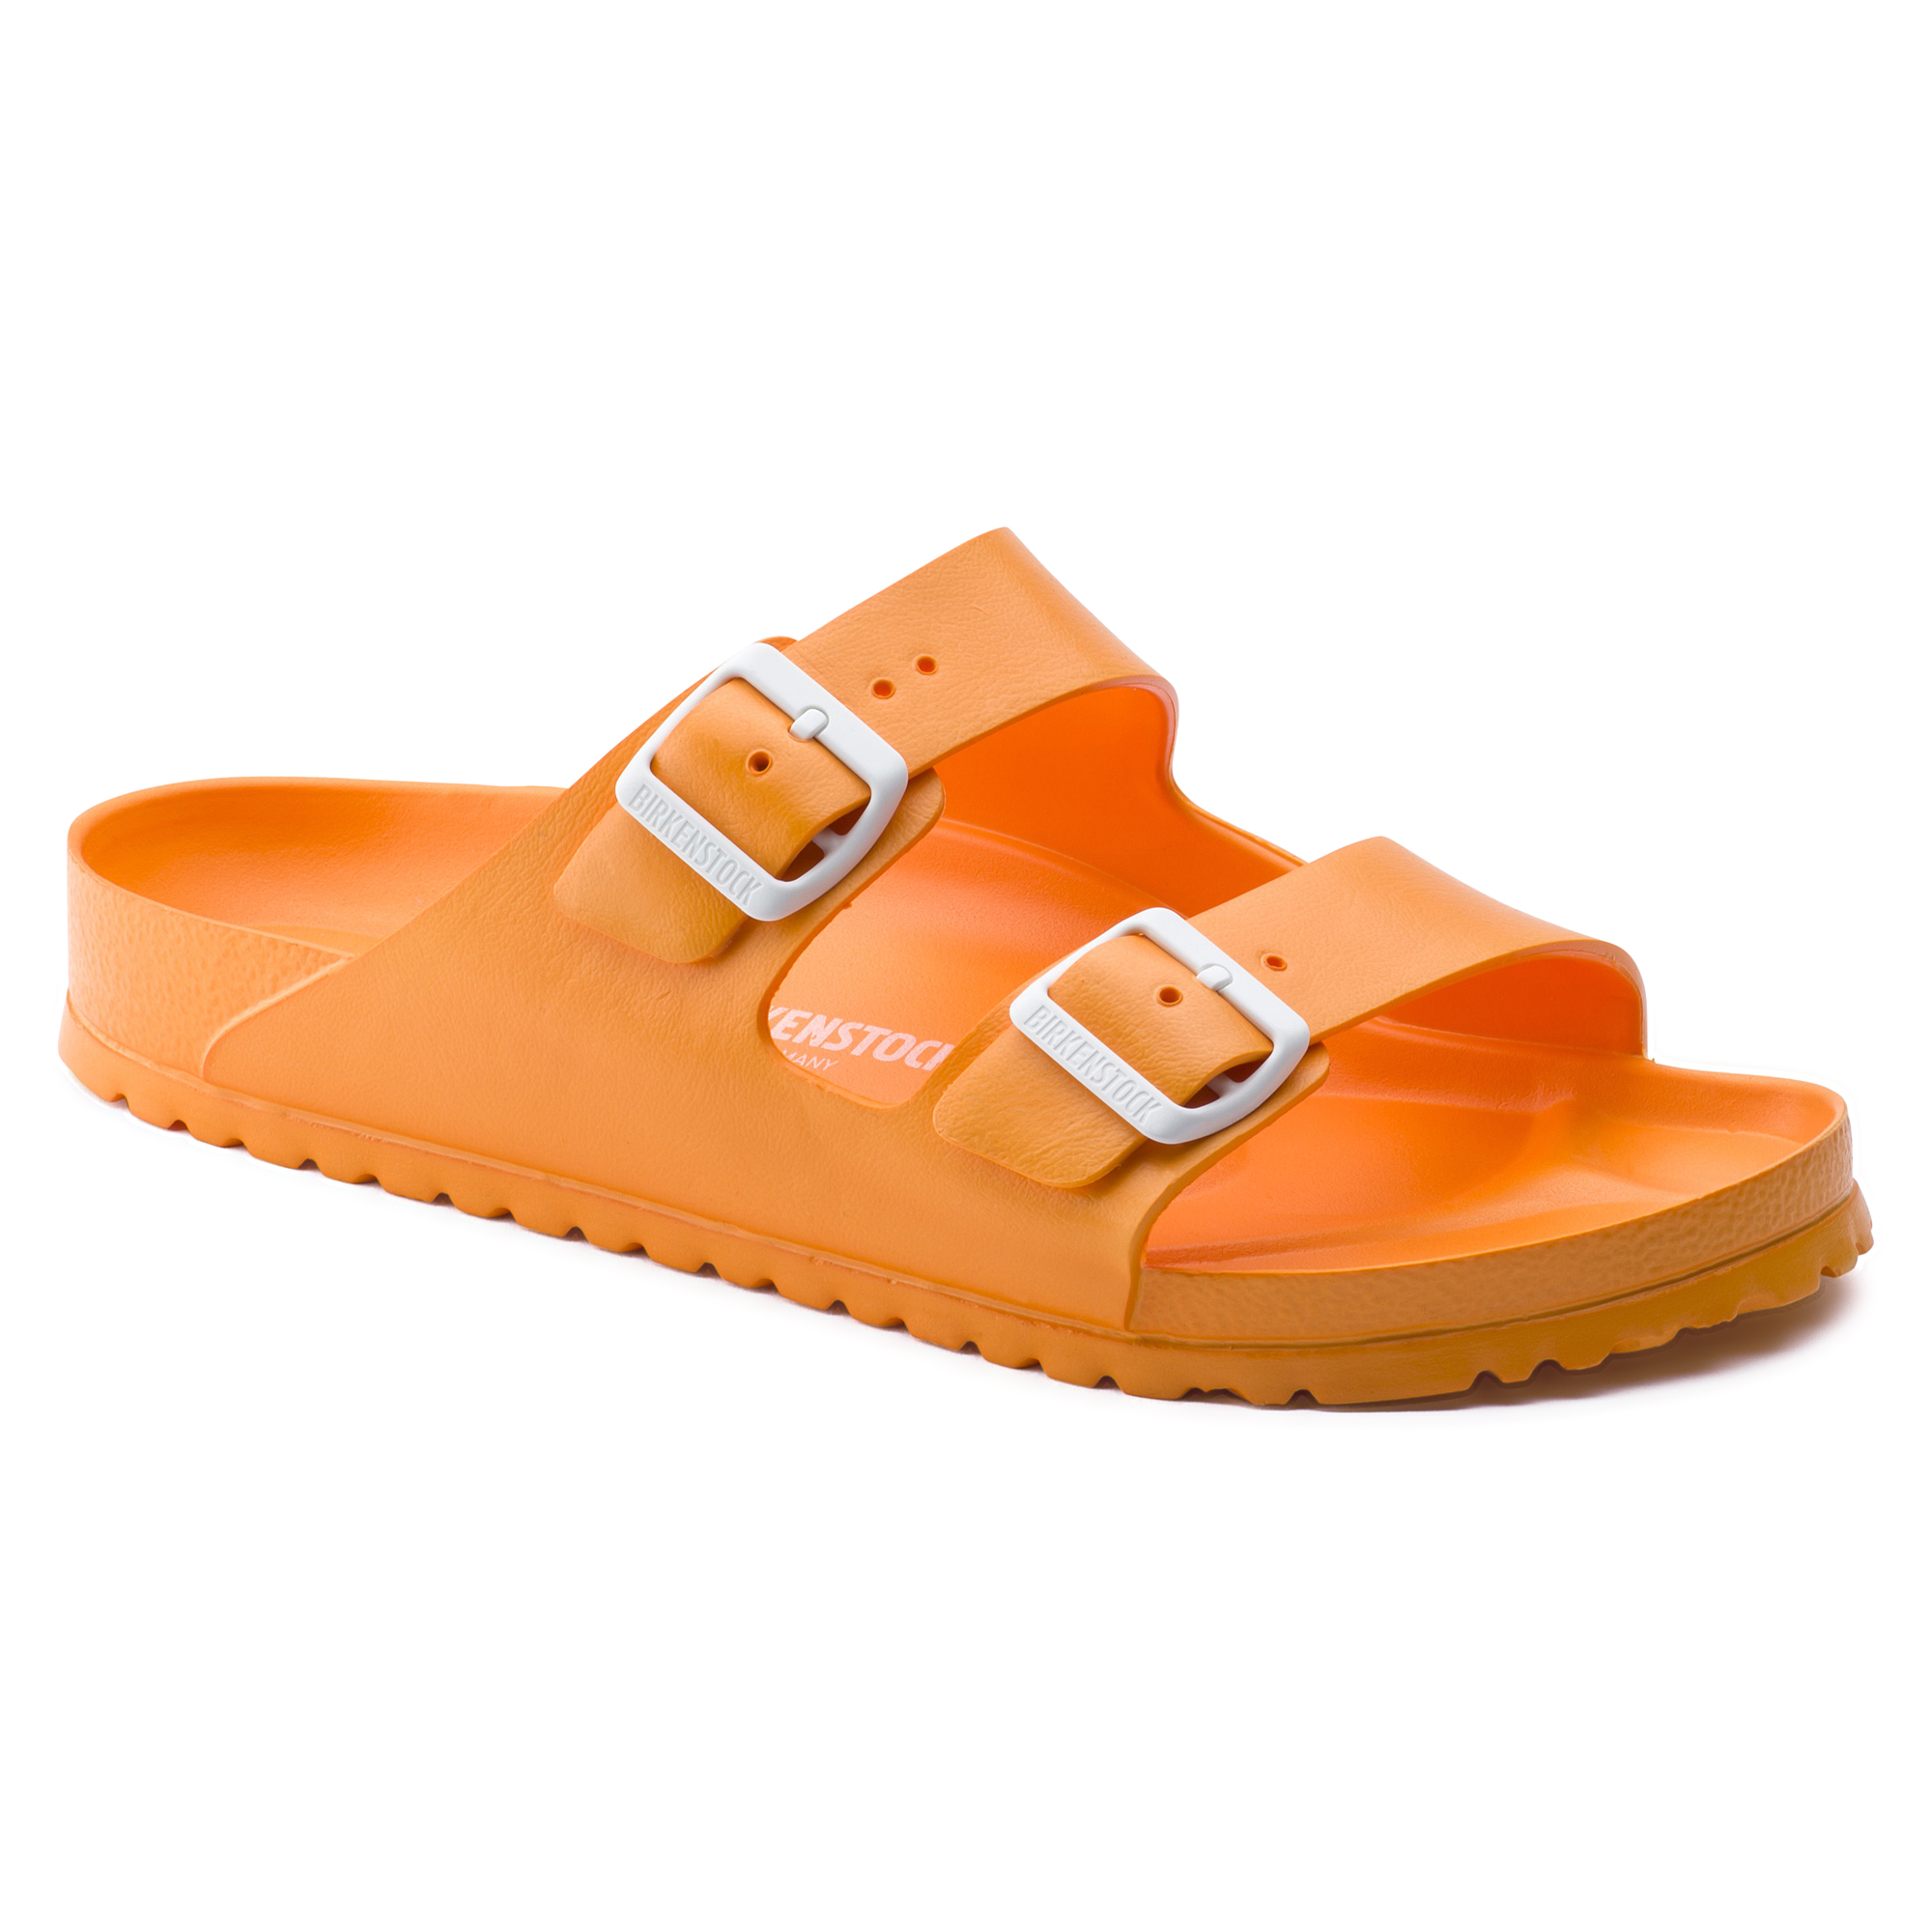 15049ff8a92c21 Arizona EVA Neon Orange